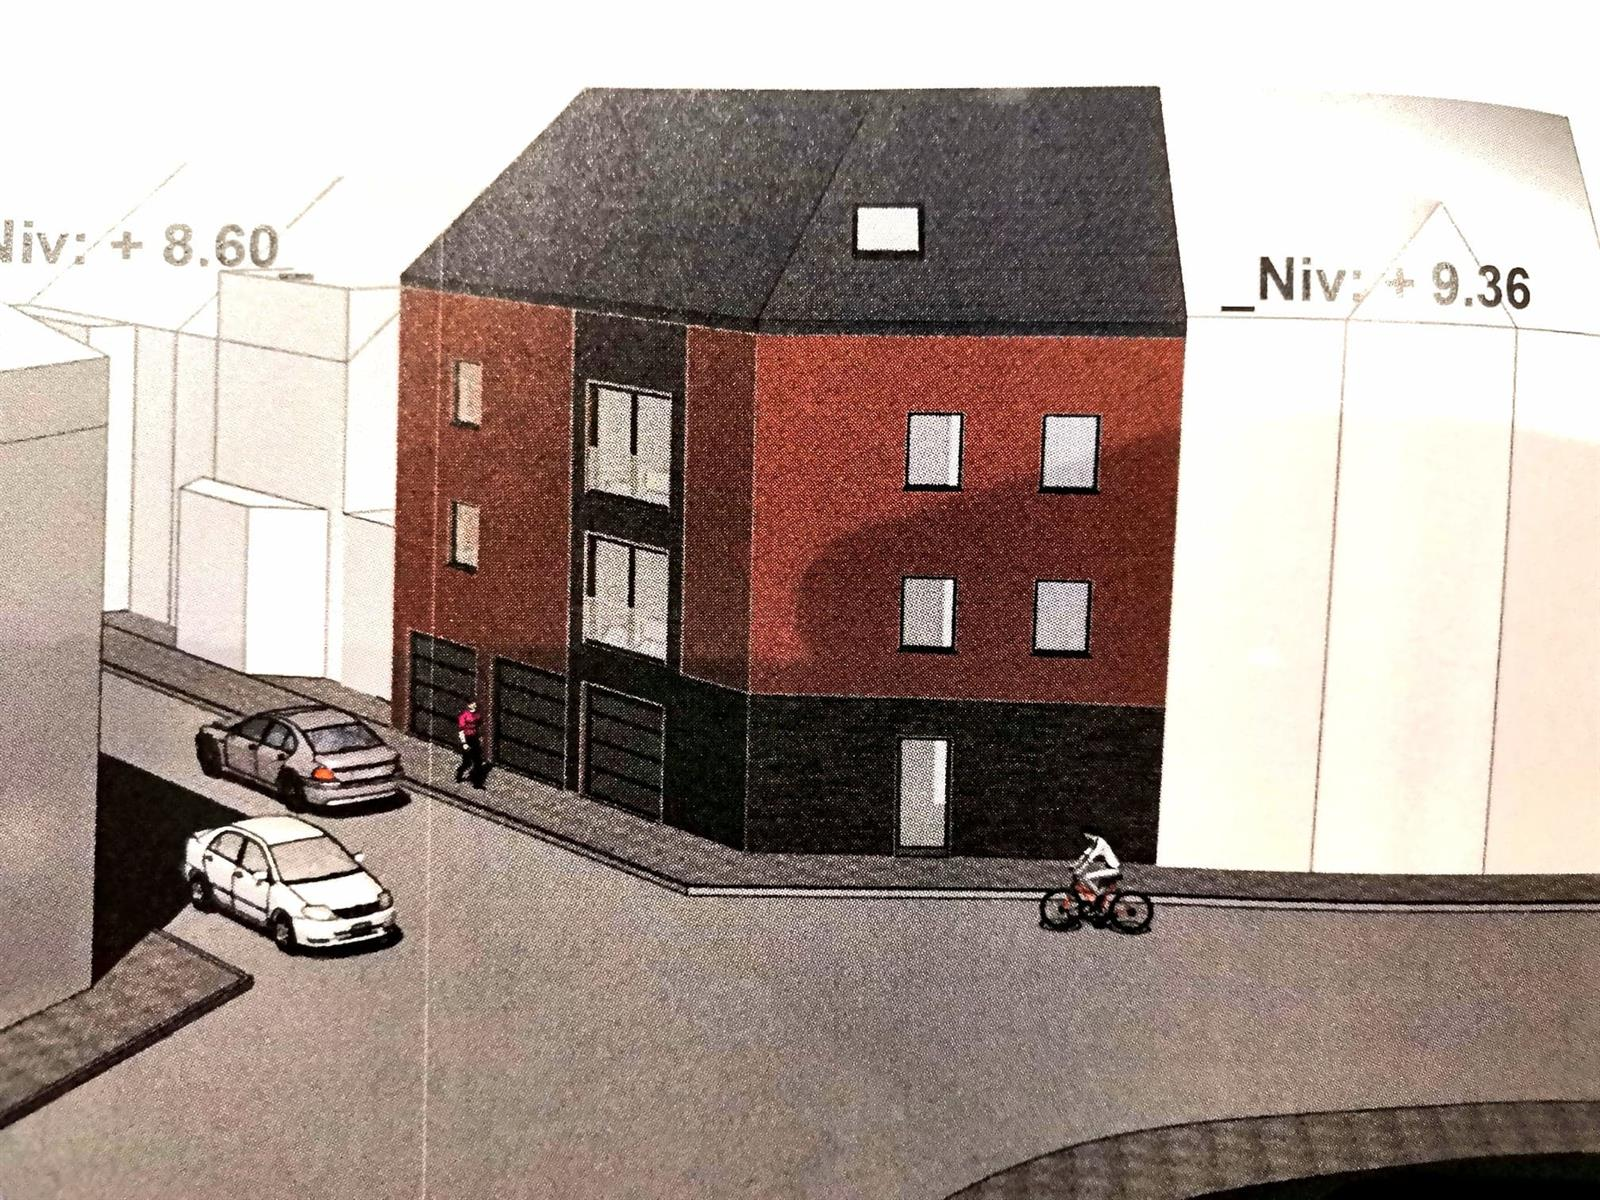 Terrain à bâtir (projets) - Charleroi - #3957840-2